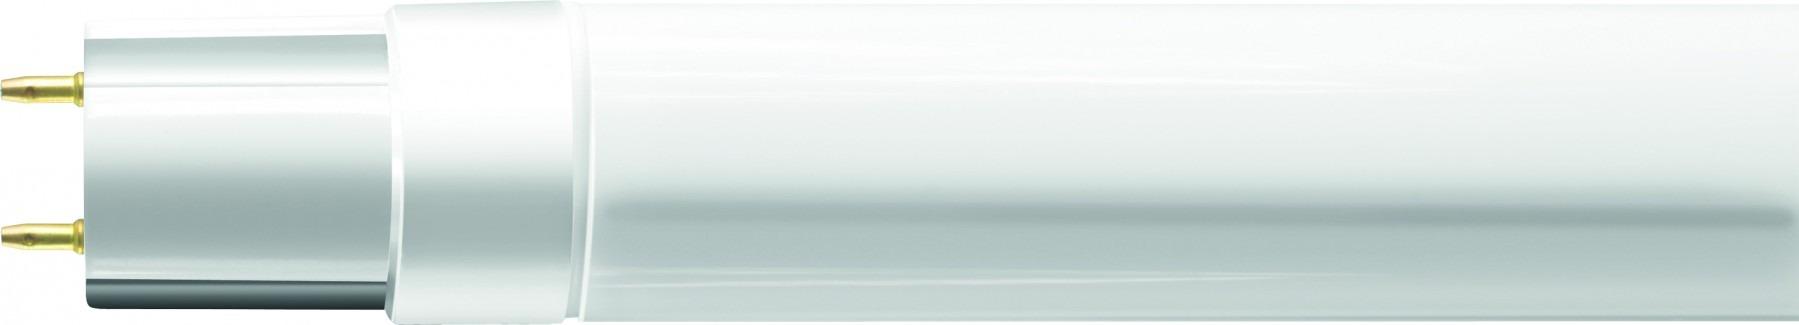 Philips CorePro LED tube 120 cm Röhre 16 Watt neutralweiß